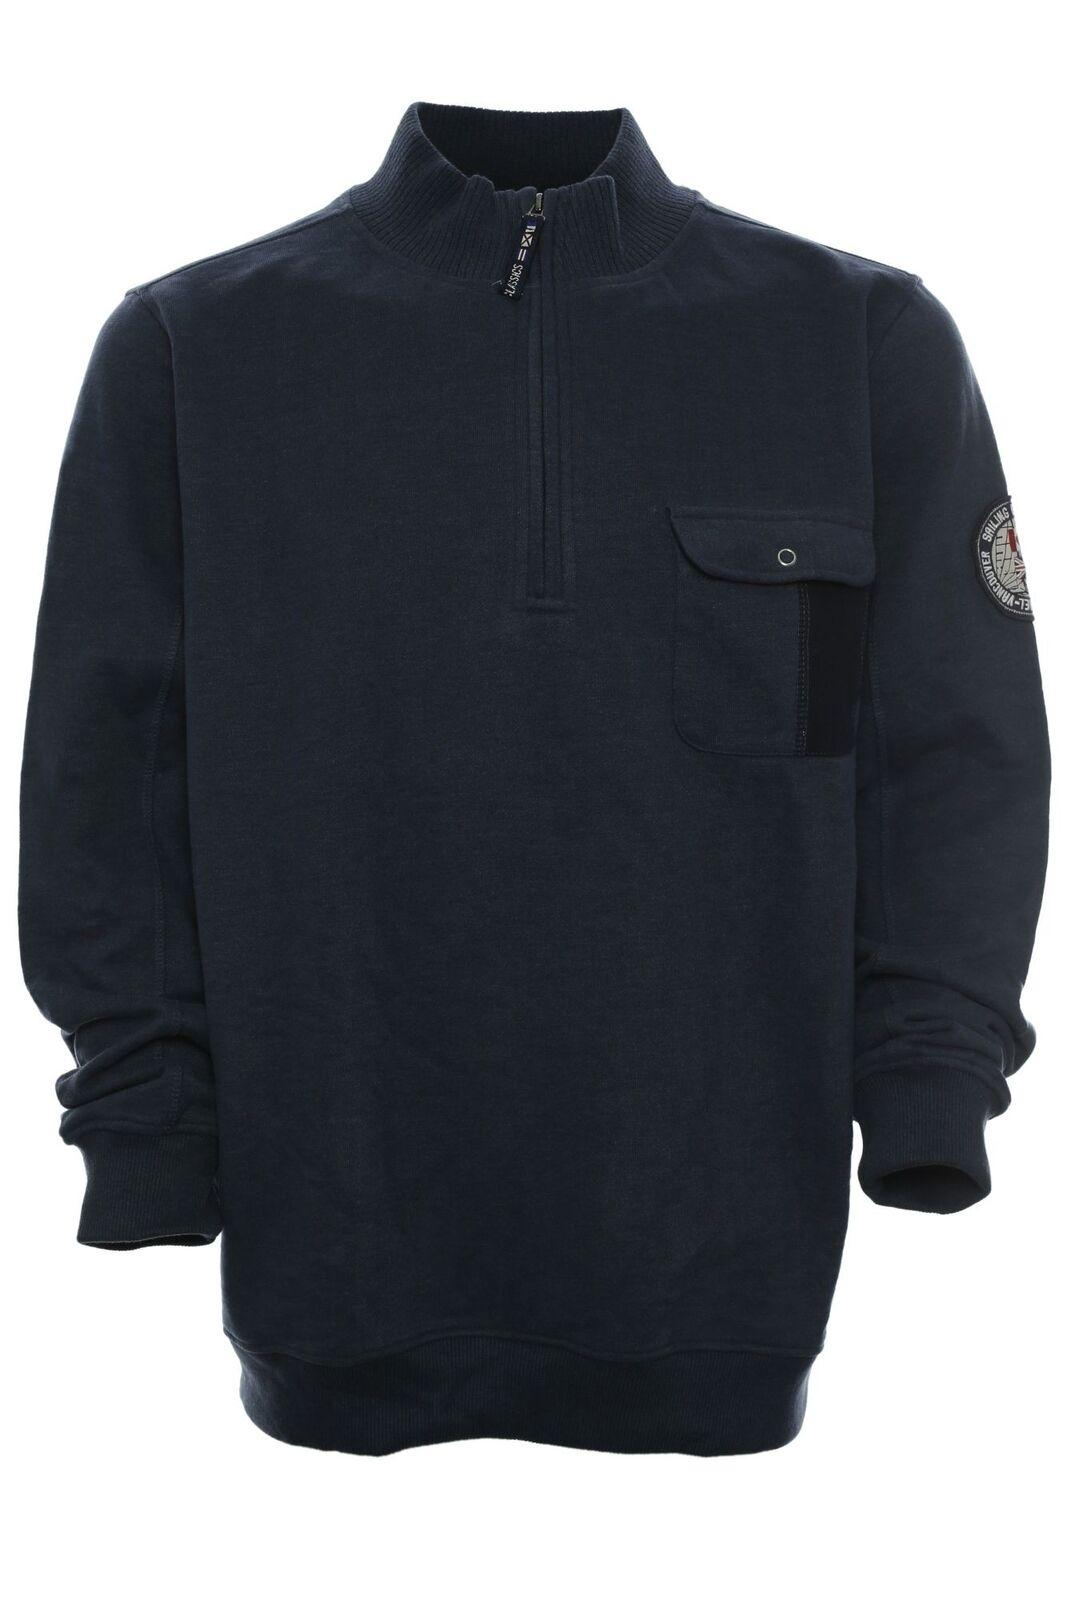 Kitaro Sweatshirt Sweat Troyer Herren Langarm Baumwolle Maritime Classics